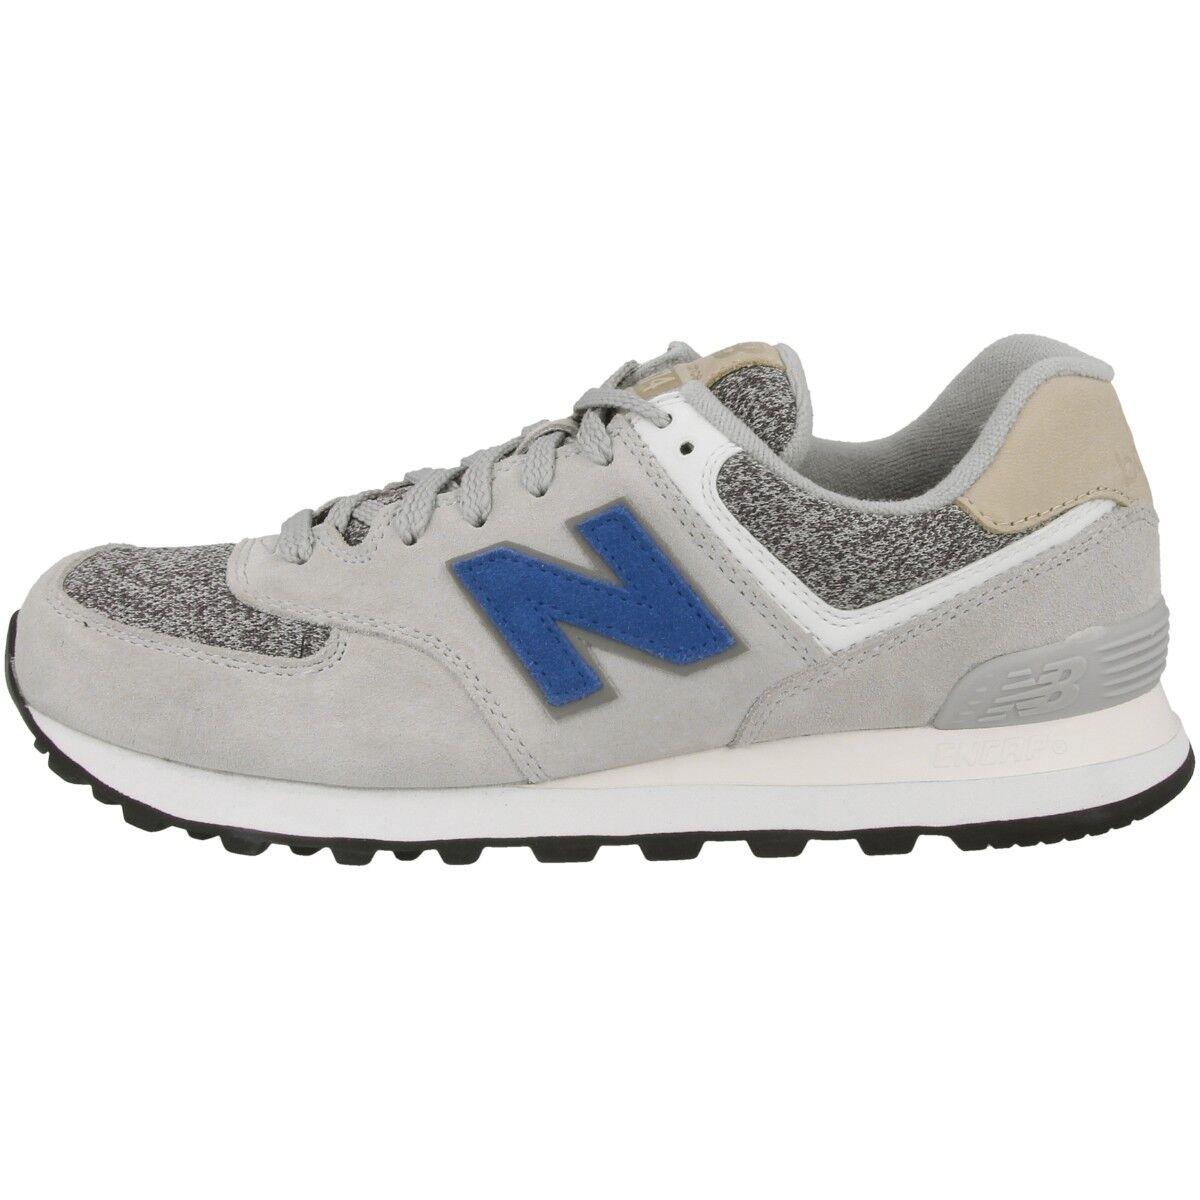 Zapatos promocionales para hombres y mujeres New Balance ML574 VAH Schuhe silver mink incense blue ML574VAH Freizeit Sneaker